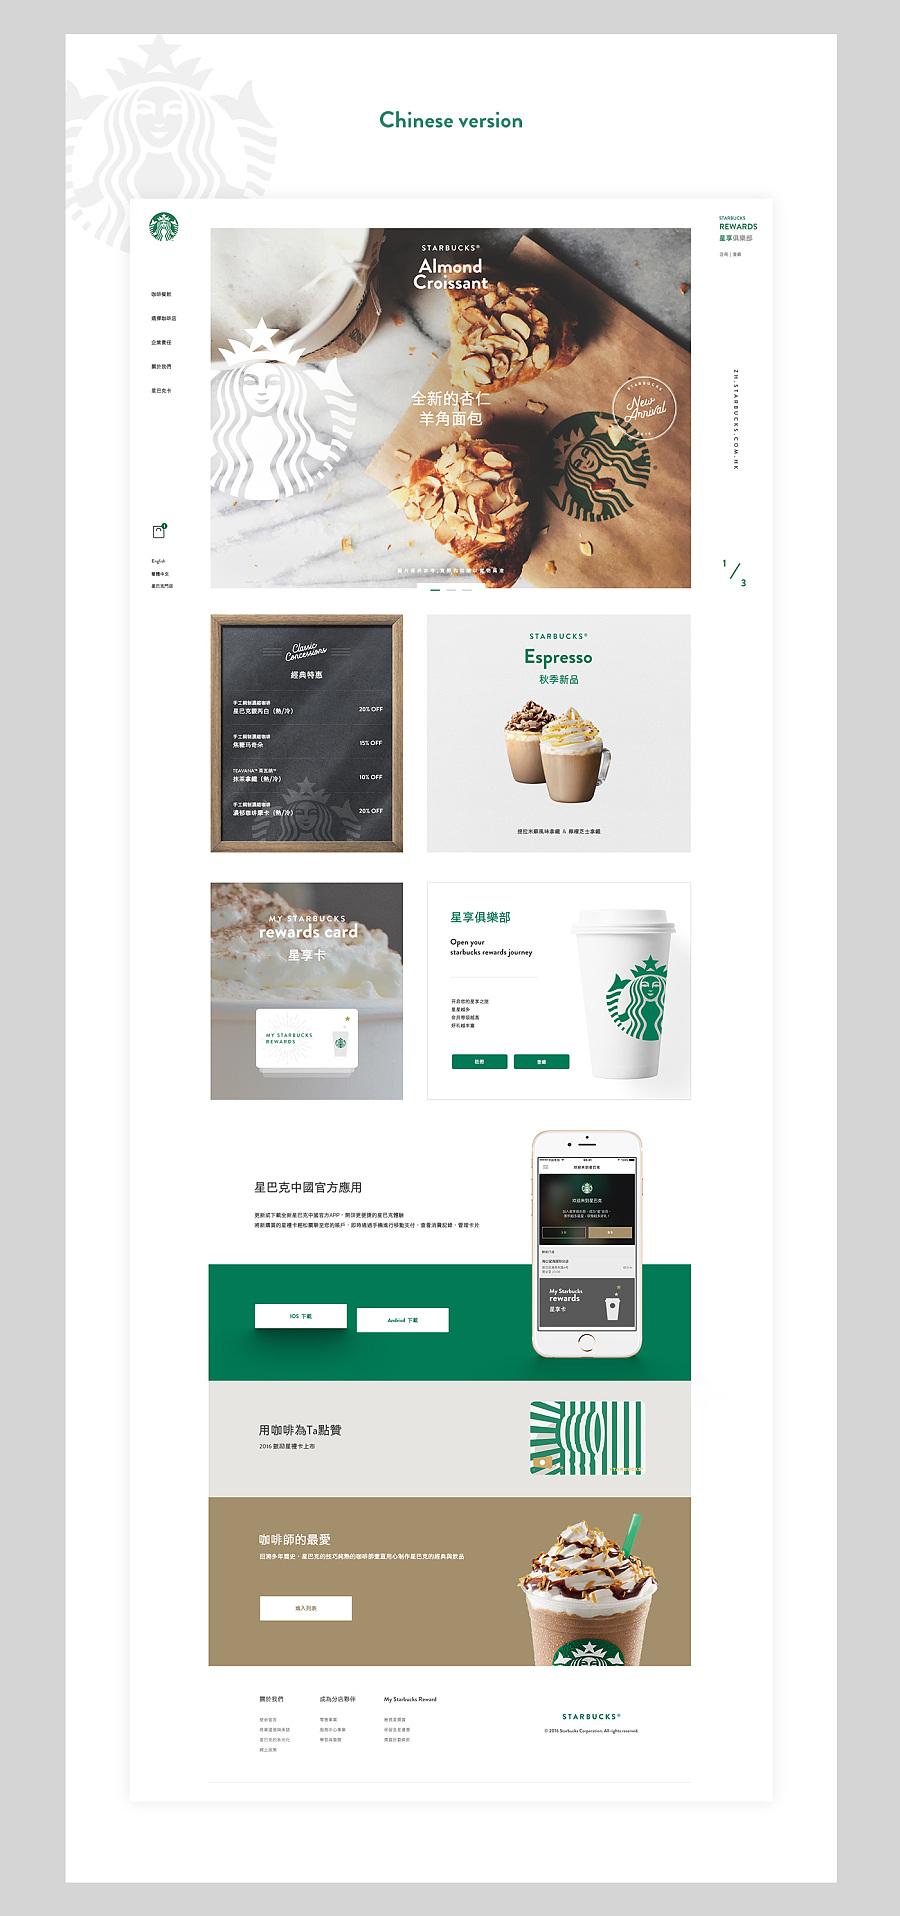 查看《Starbucks some redesign》原图,原图尺寸:1400x2981